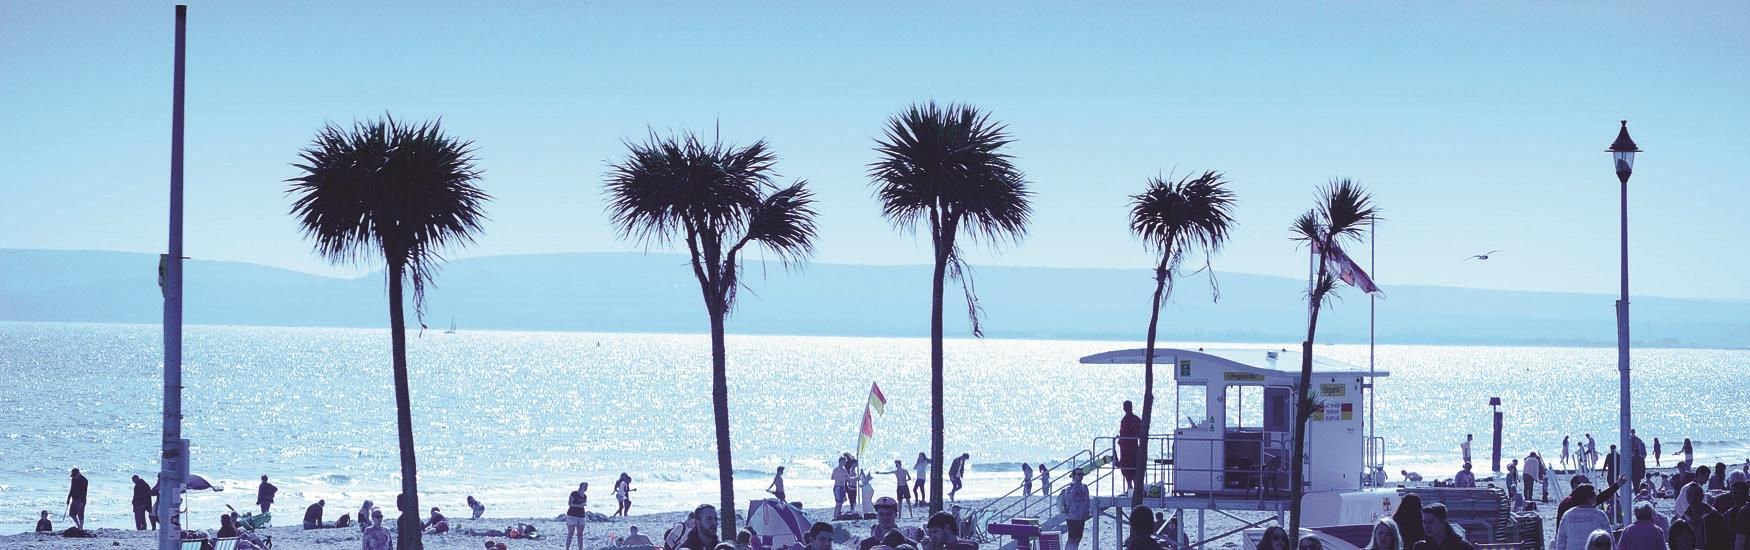 Enjoy seven miles of beautiful coastline